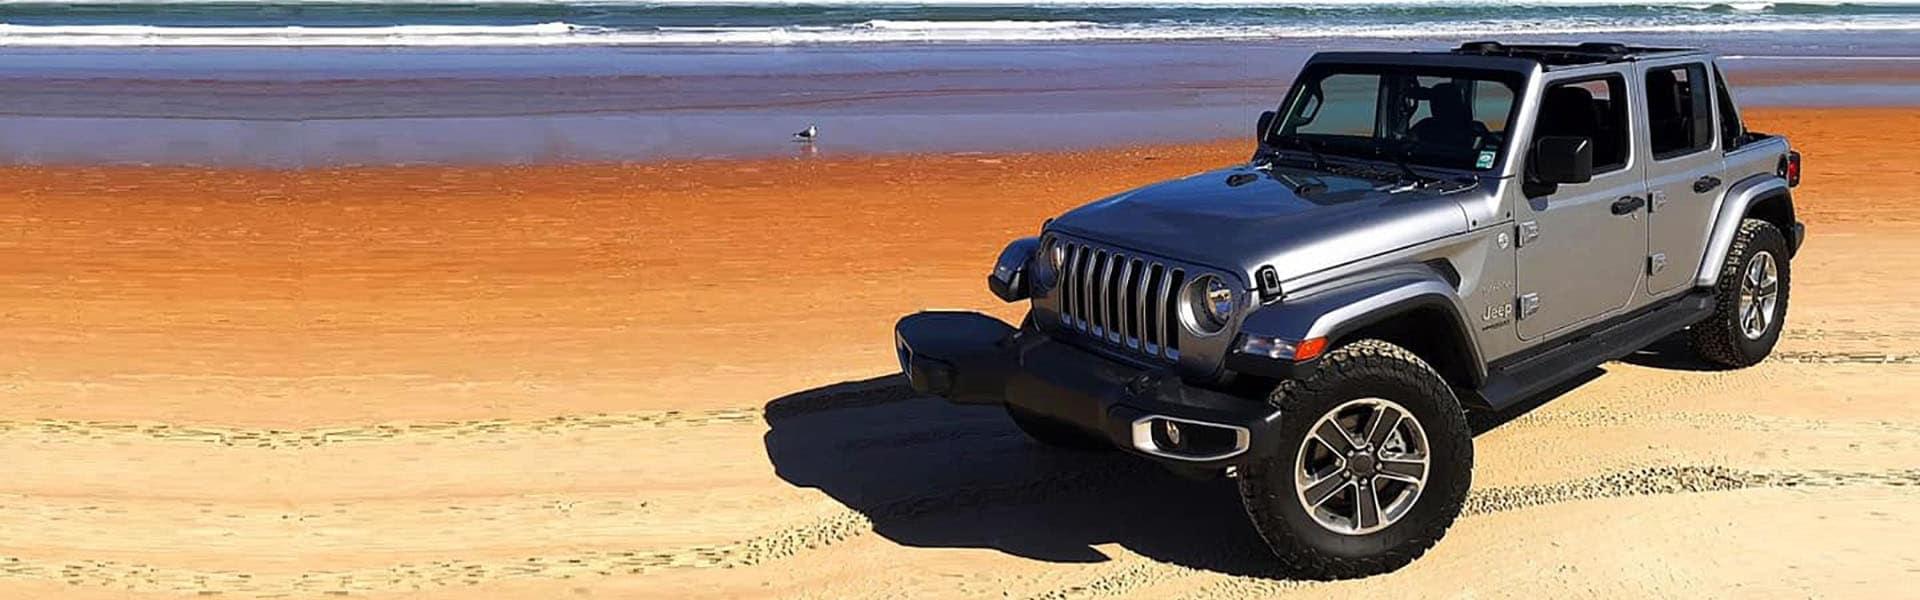 Rick-Hendrick-Jeep-Chrysler-Dodge-RAM-Mar21_TR_Homepage-Header2-1920x600